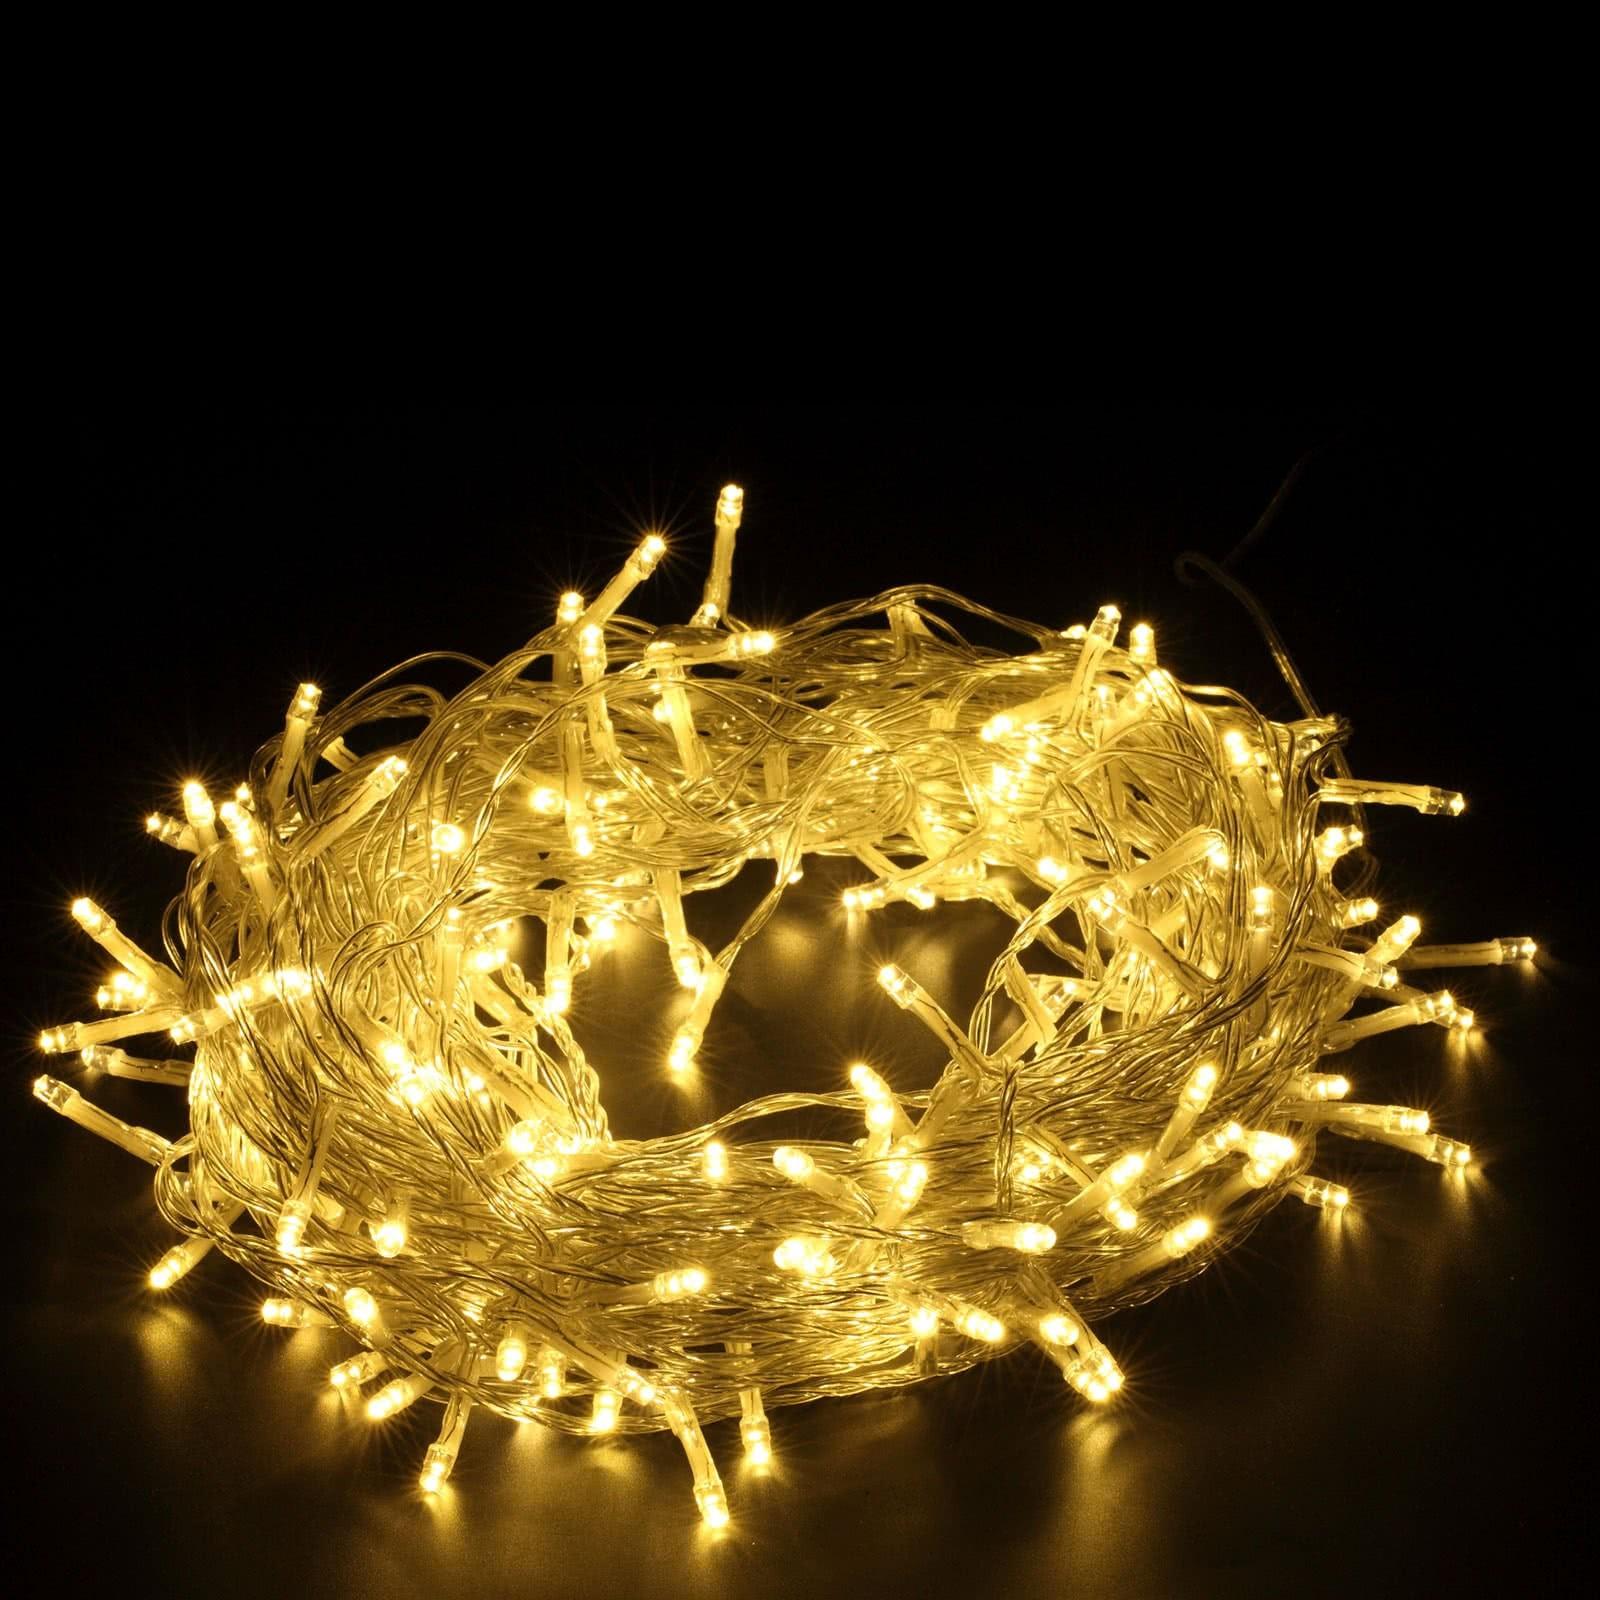 Led Weihnachtsbeleuchtung Warmweiss.200er Led Lichterkette Warmweiß Yorbay De